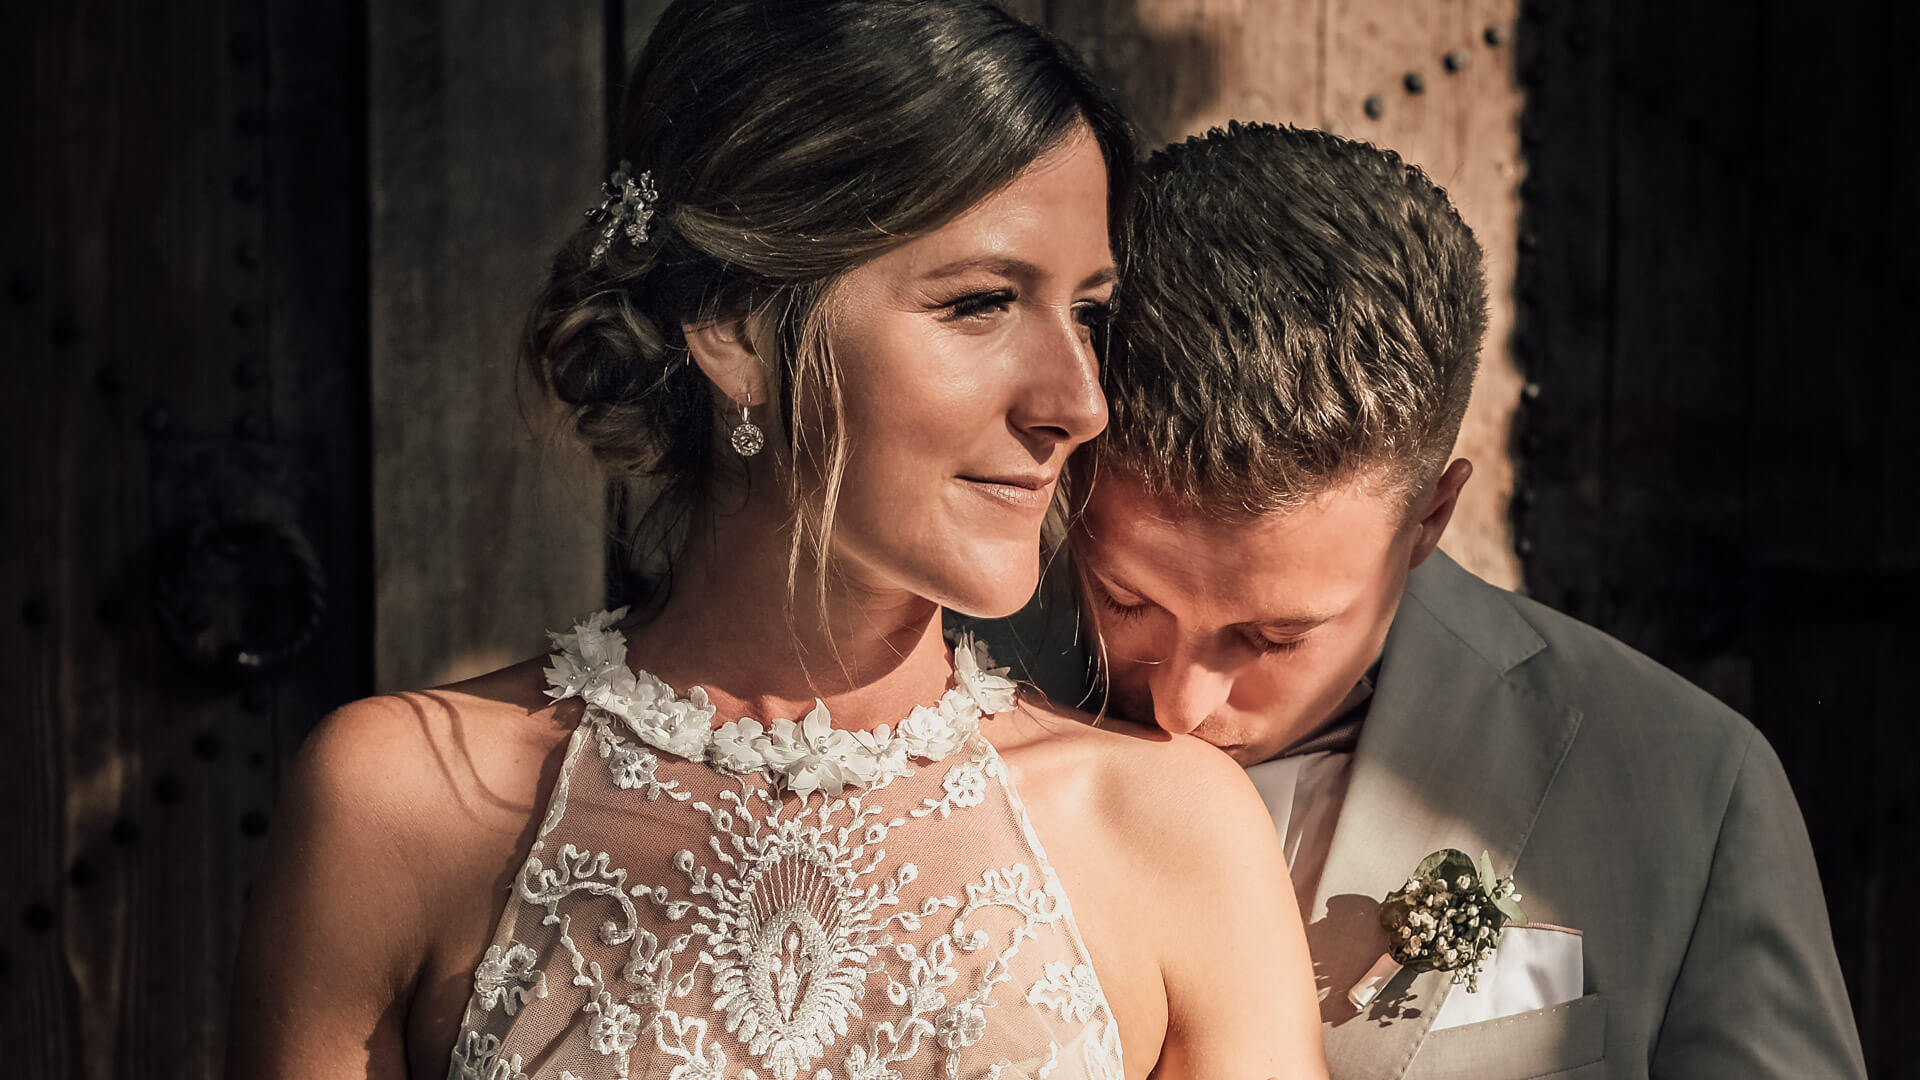 Hochzeitsfotograf Köln Brautpaar Shooting Kommandeursburg